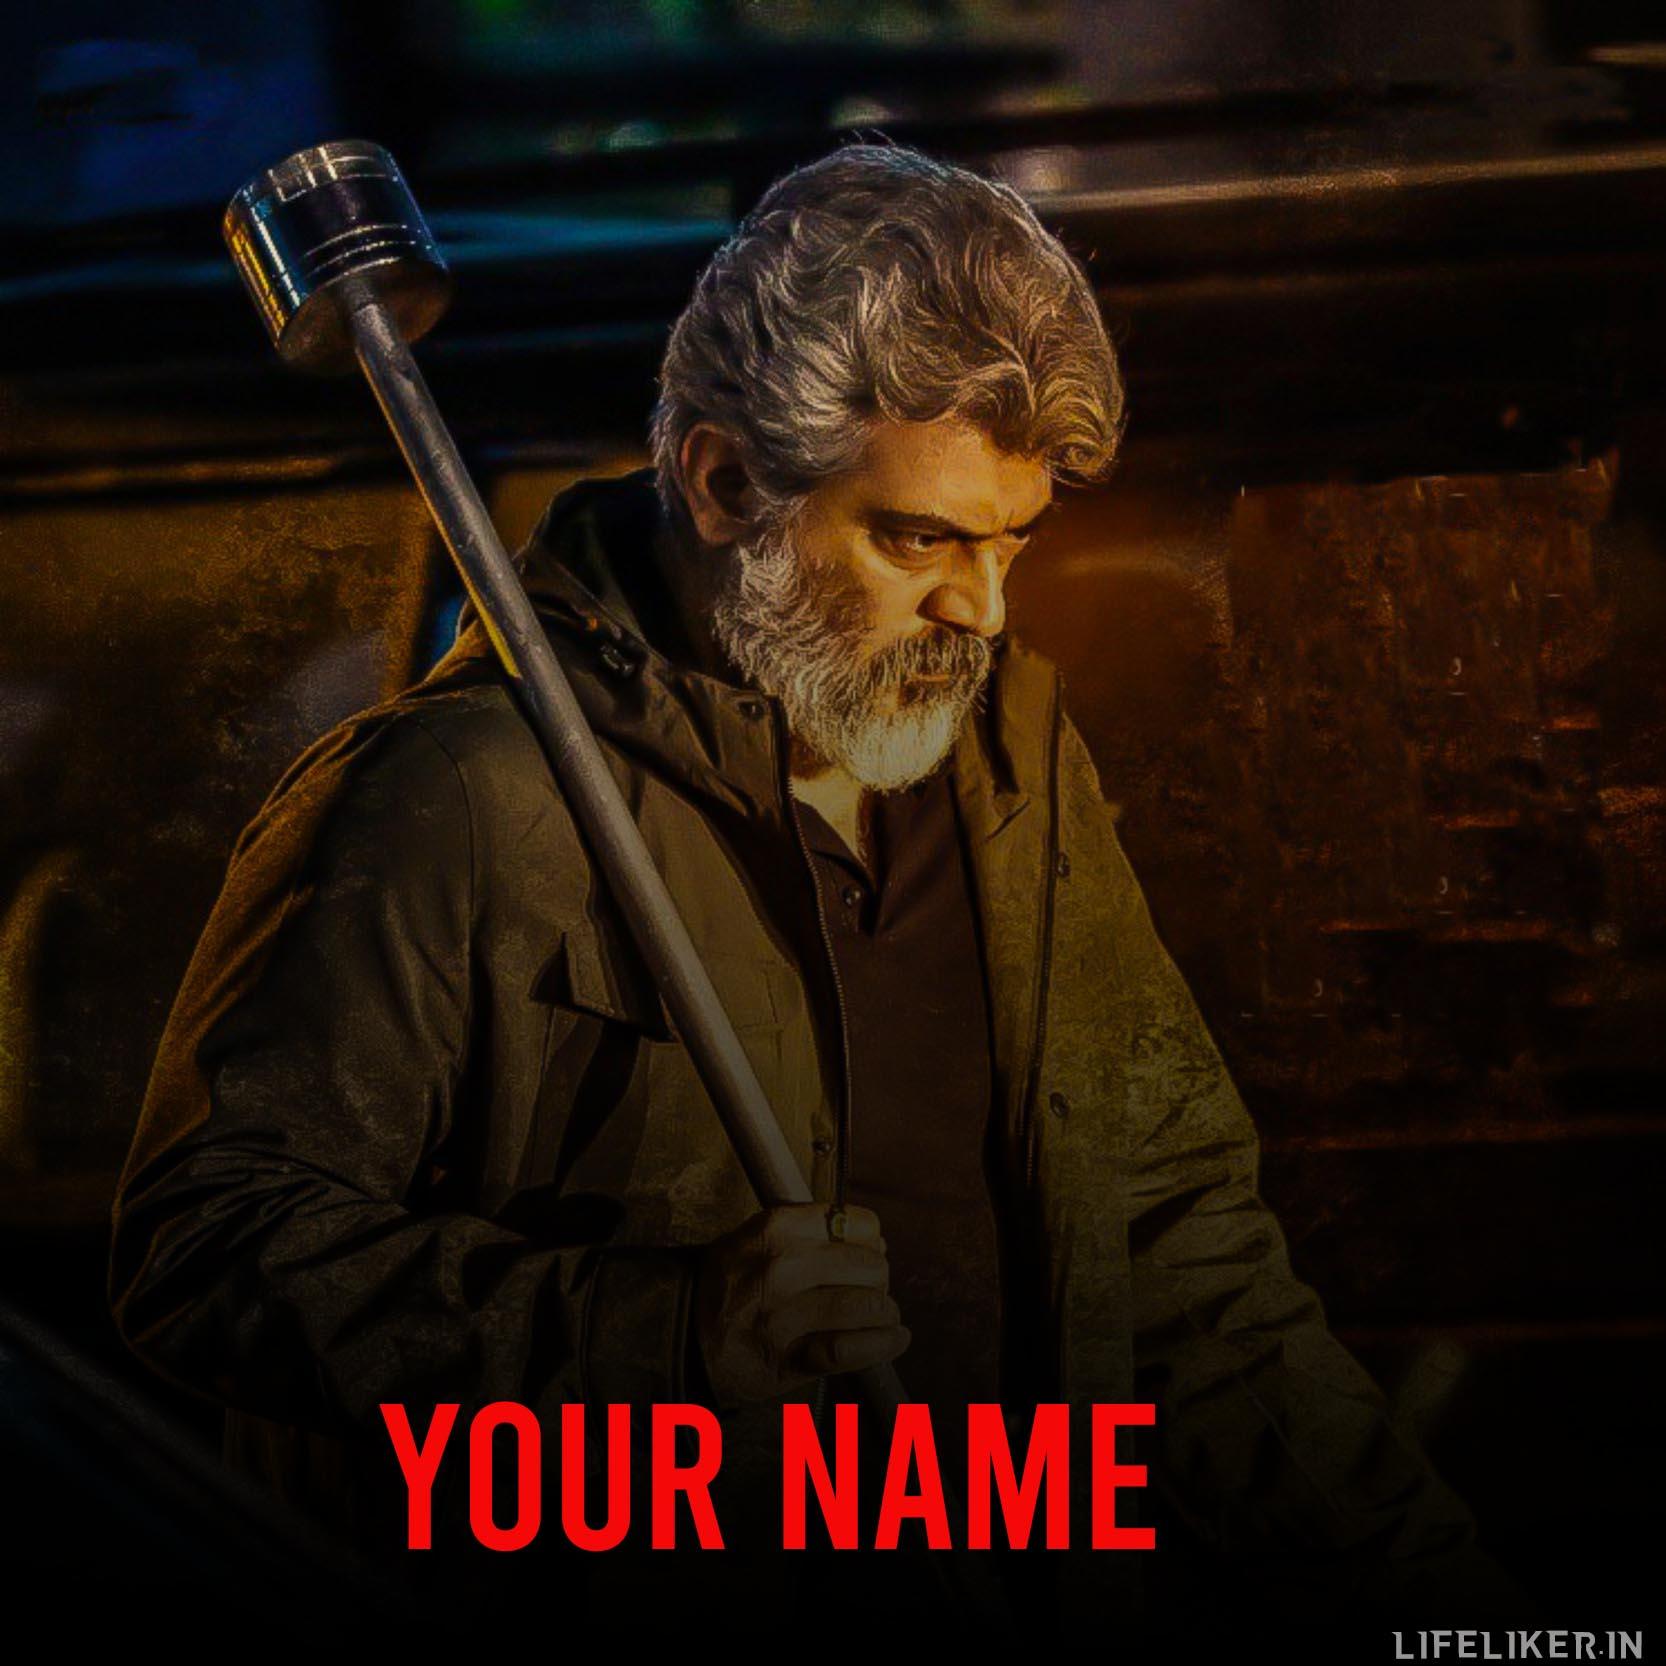 Ajith Movie Font Genertor - Life Liker